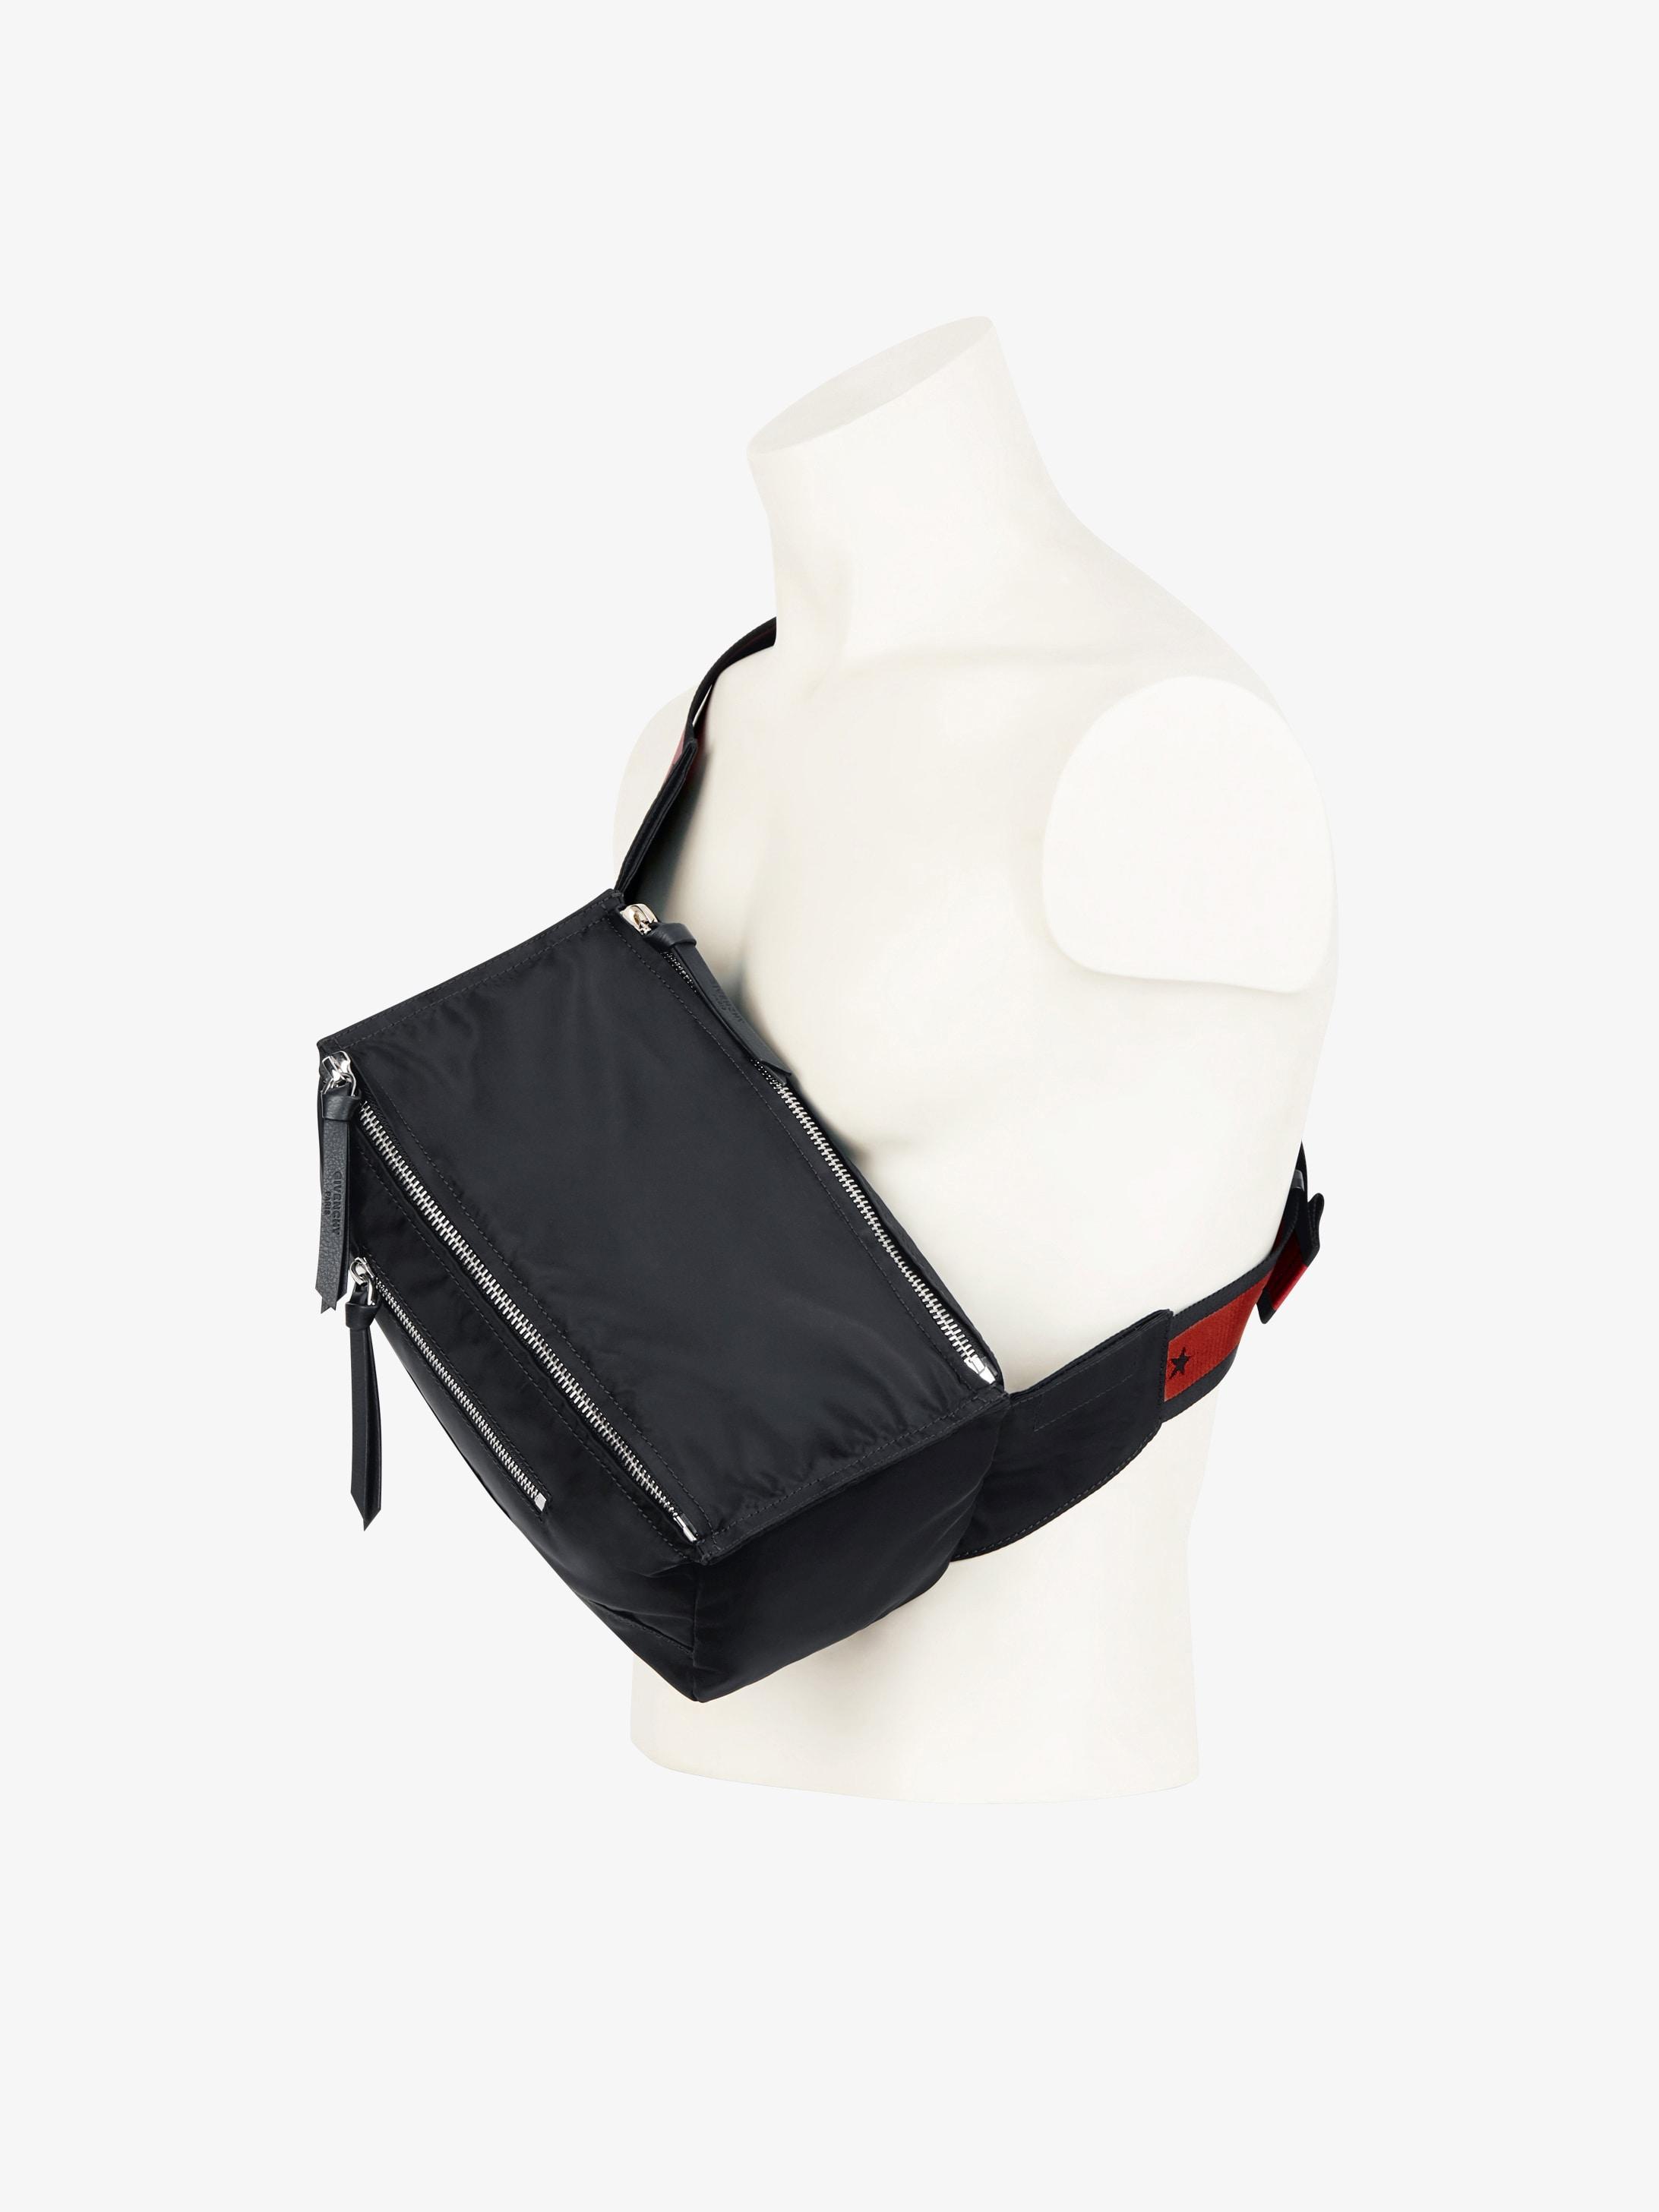 Pandora bum bag with stars tape strap